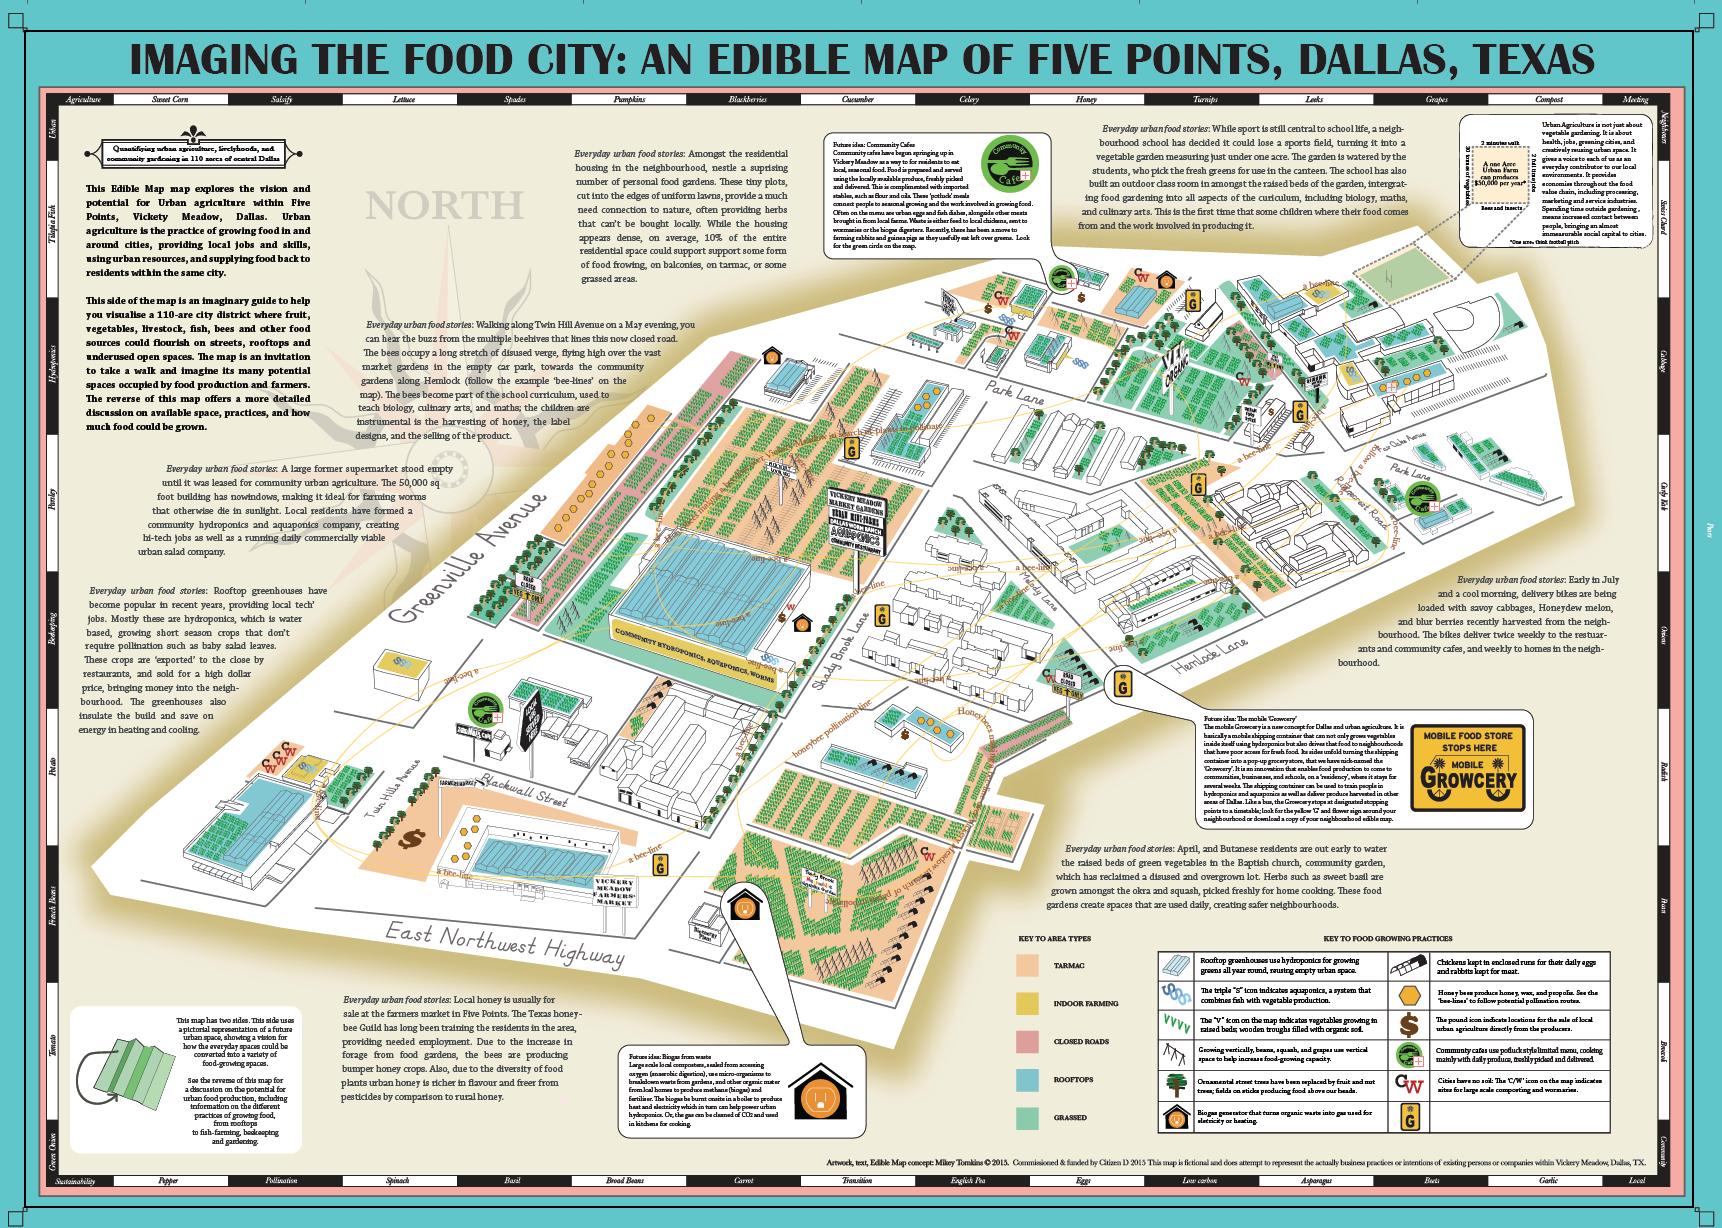 Edible Map of Dallas